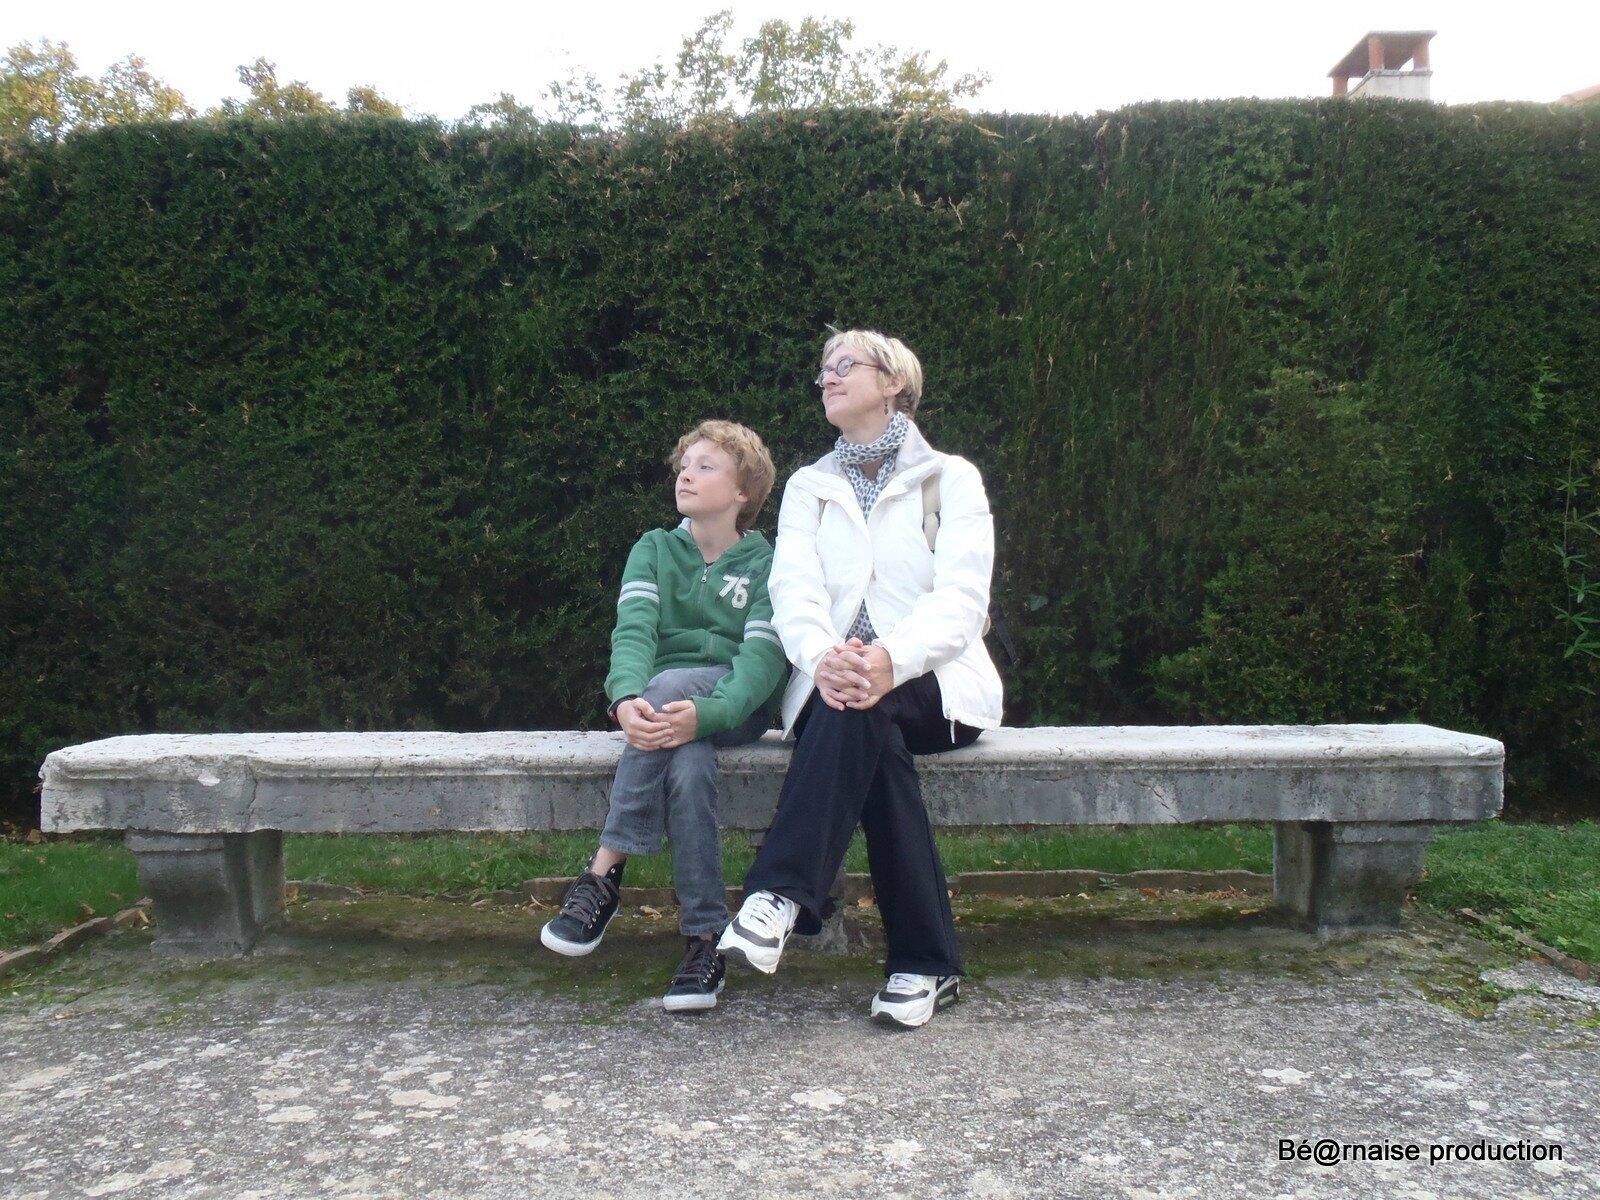 Banc et haie (Nice, octobre 2011)